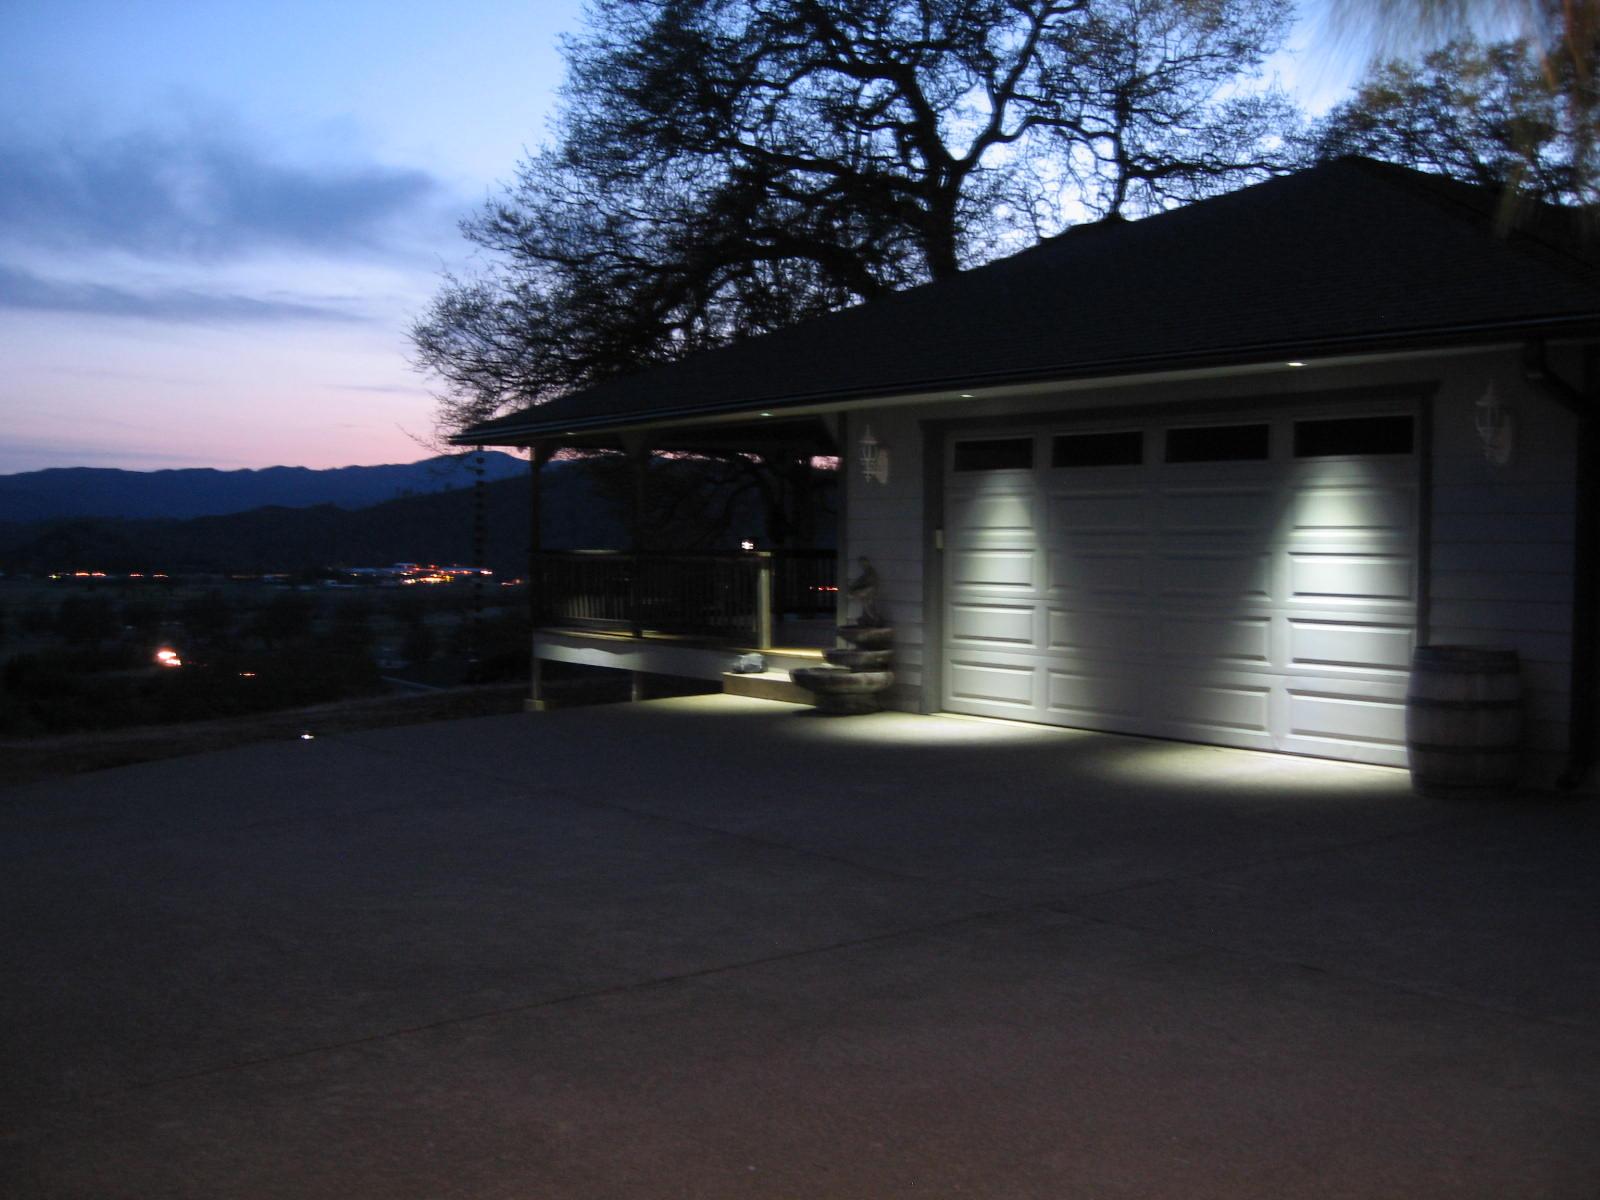 Par16 led bulb 3w landscaping mr jc bi pin r12 and for Driveway landscape lighting